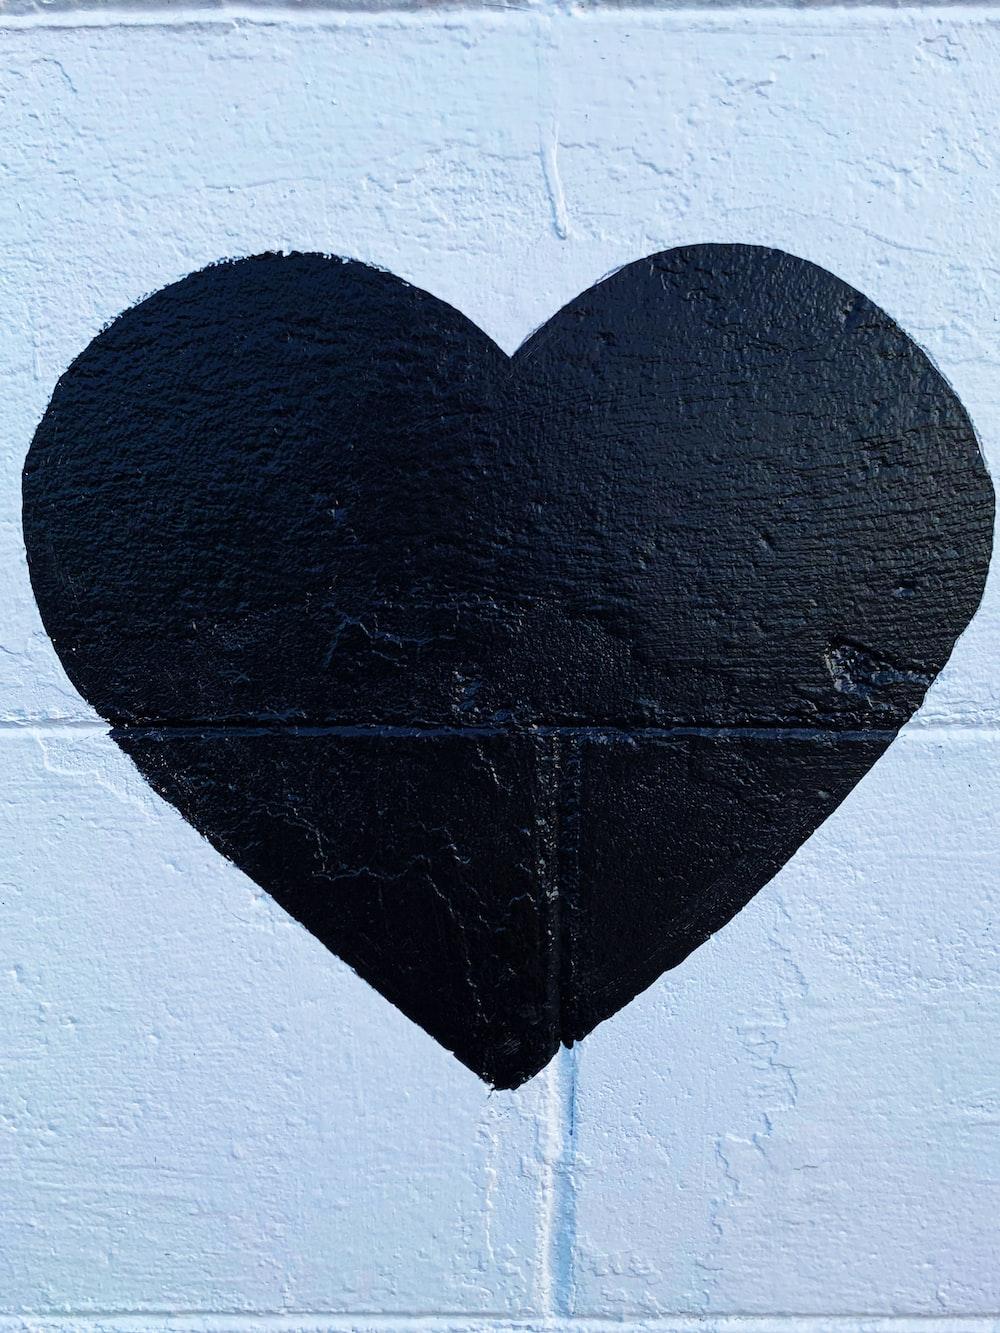 black heart printed concrete wall